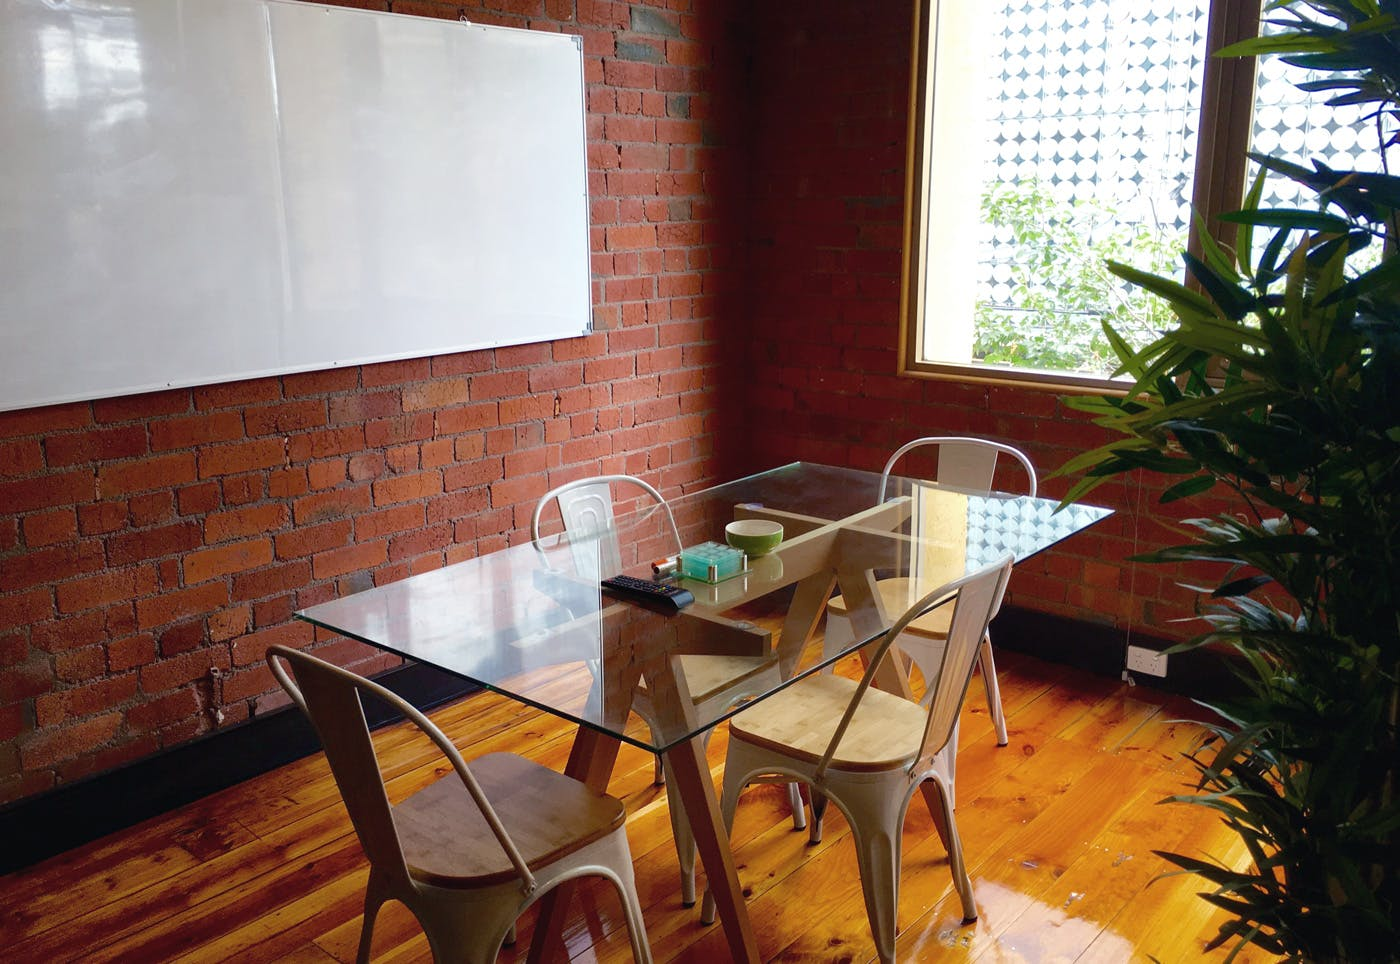 The Corner, meeting room at Framework, image 1